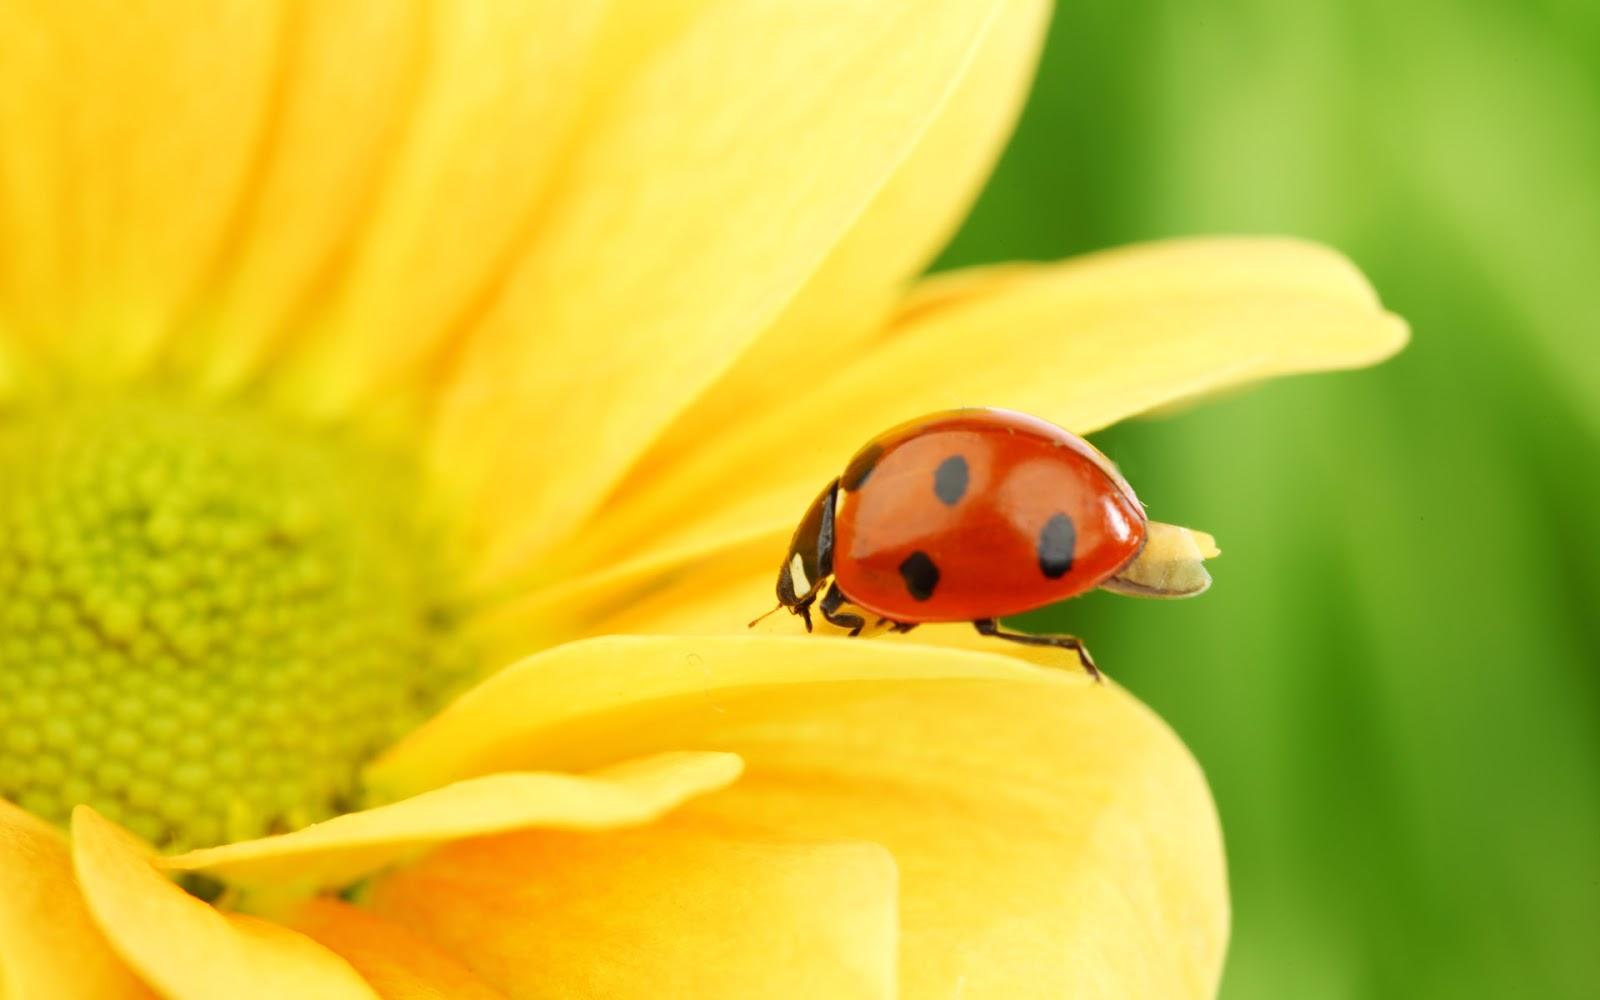 Sunflower and Ladybug Wallpaper Desktop HD